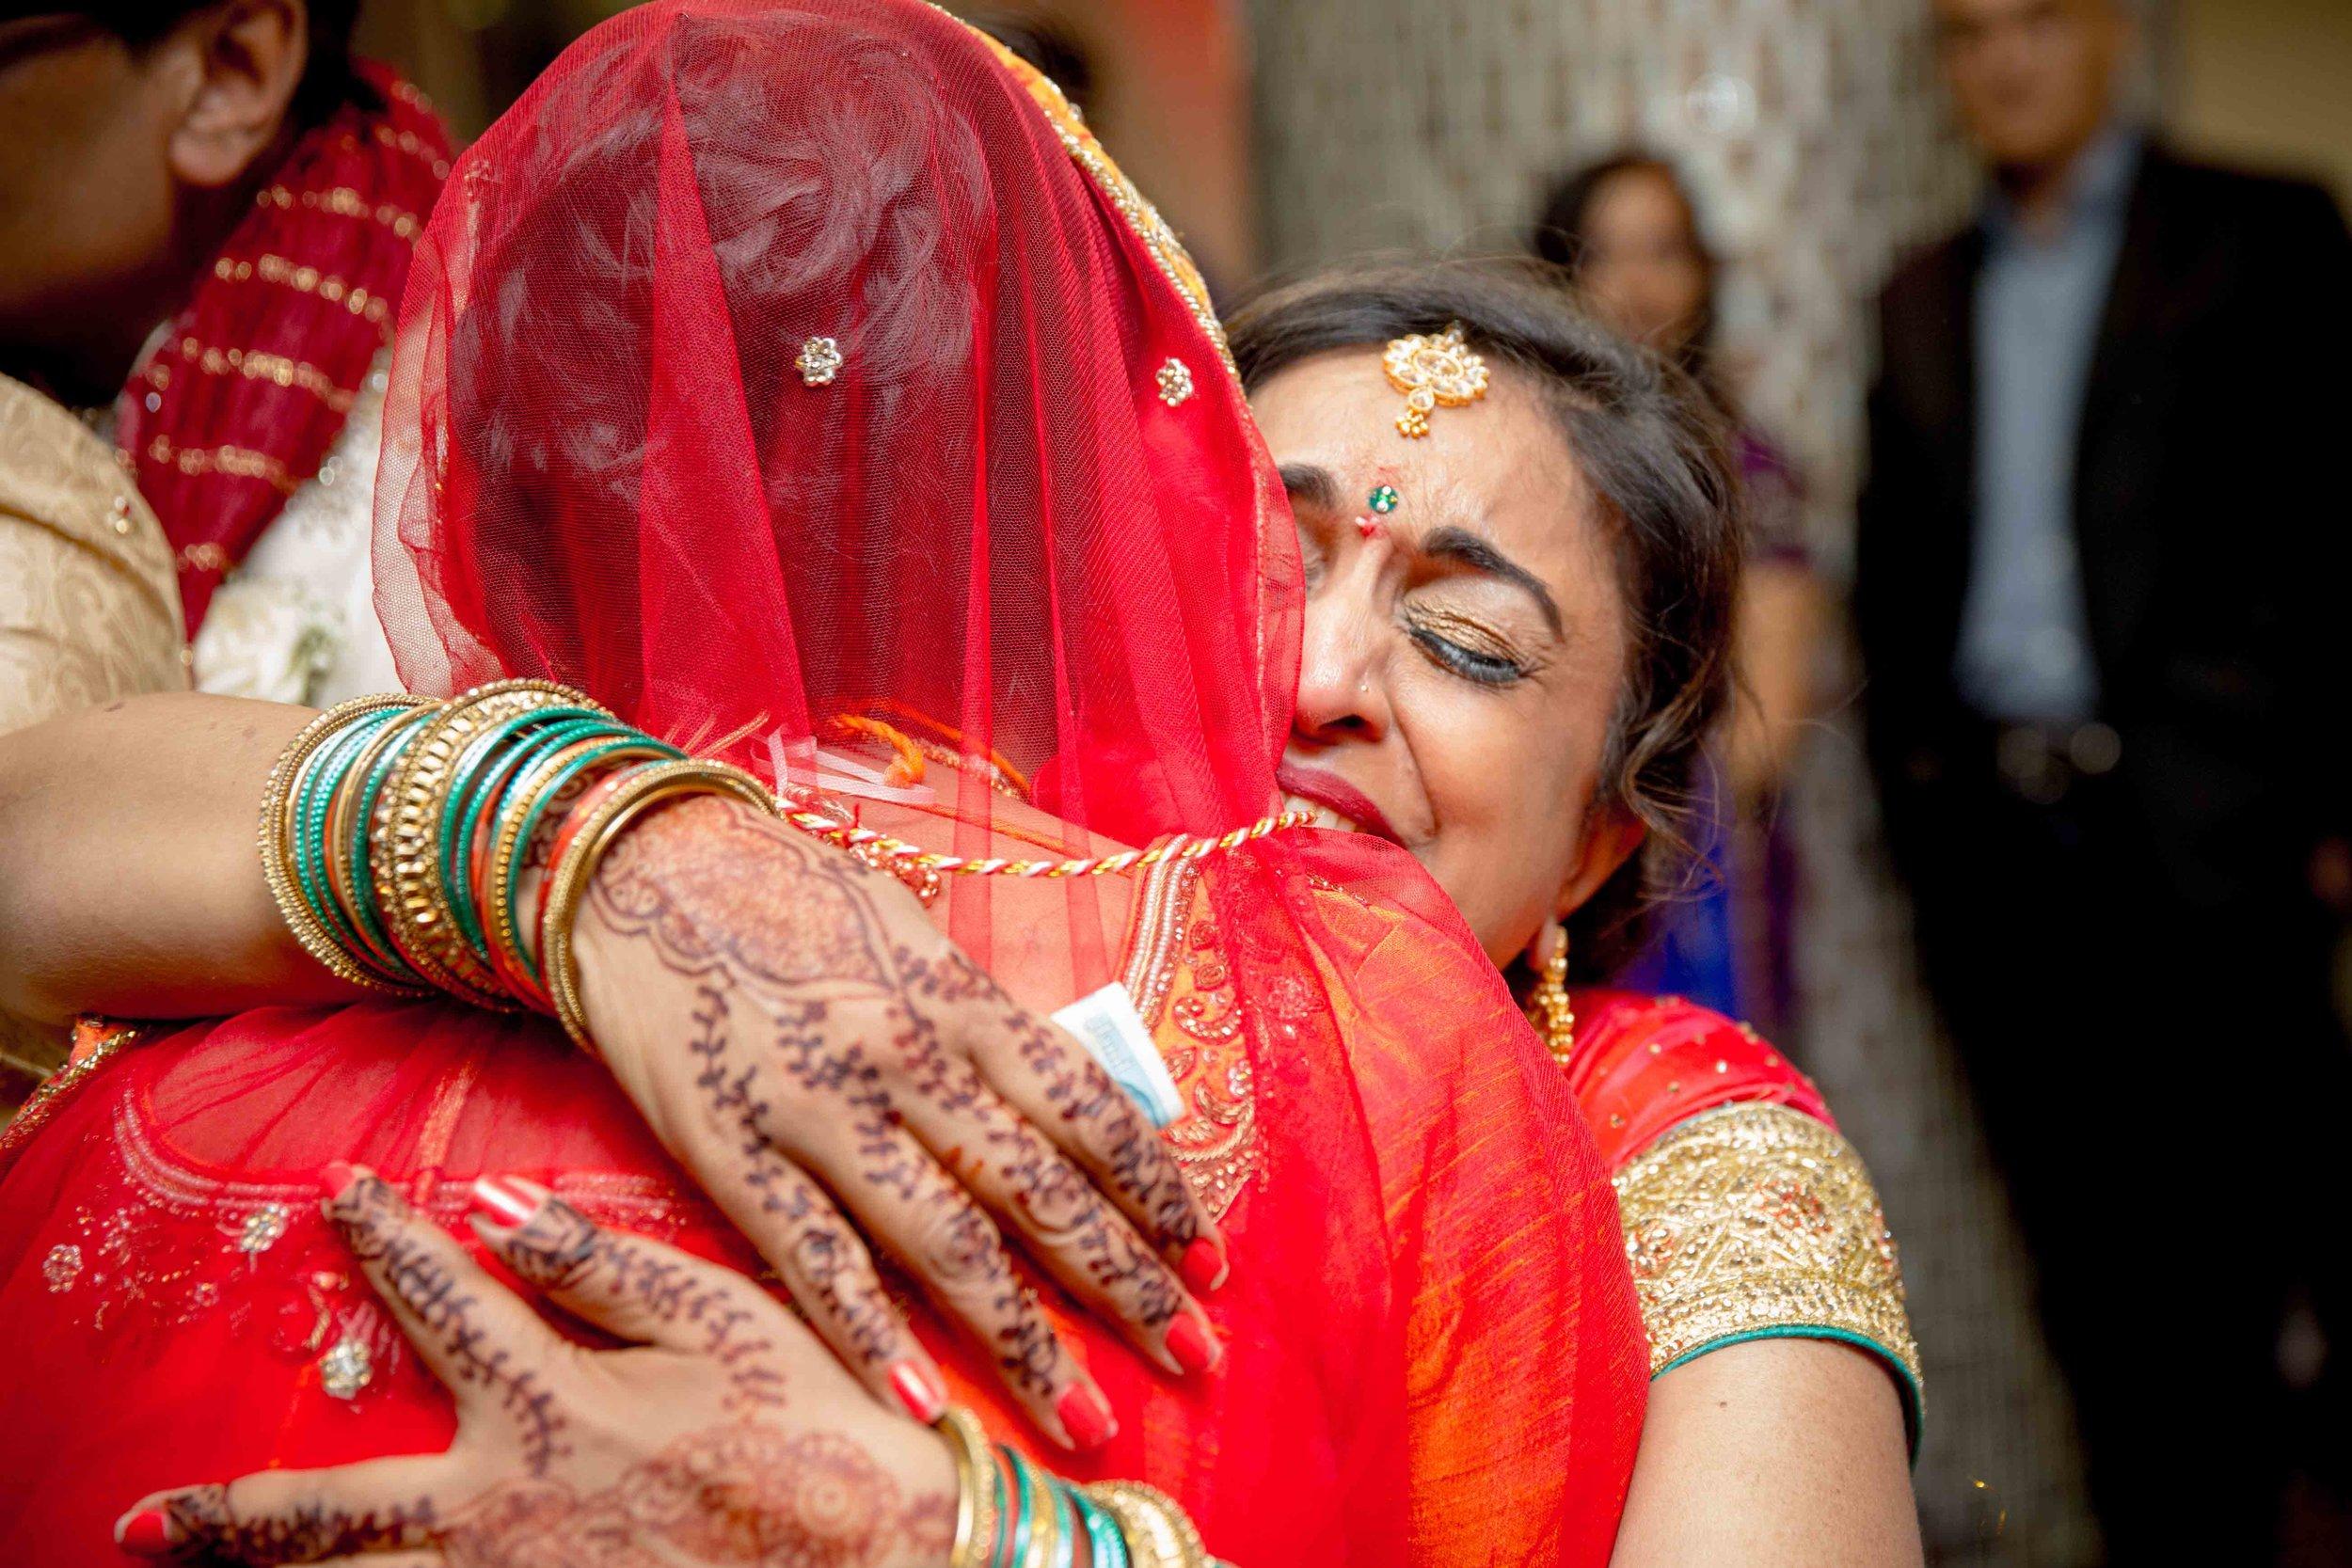 premier-banquetting-london-Hindu-asian-wedding-photographer-natalia-smith-photography-42.jpg